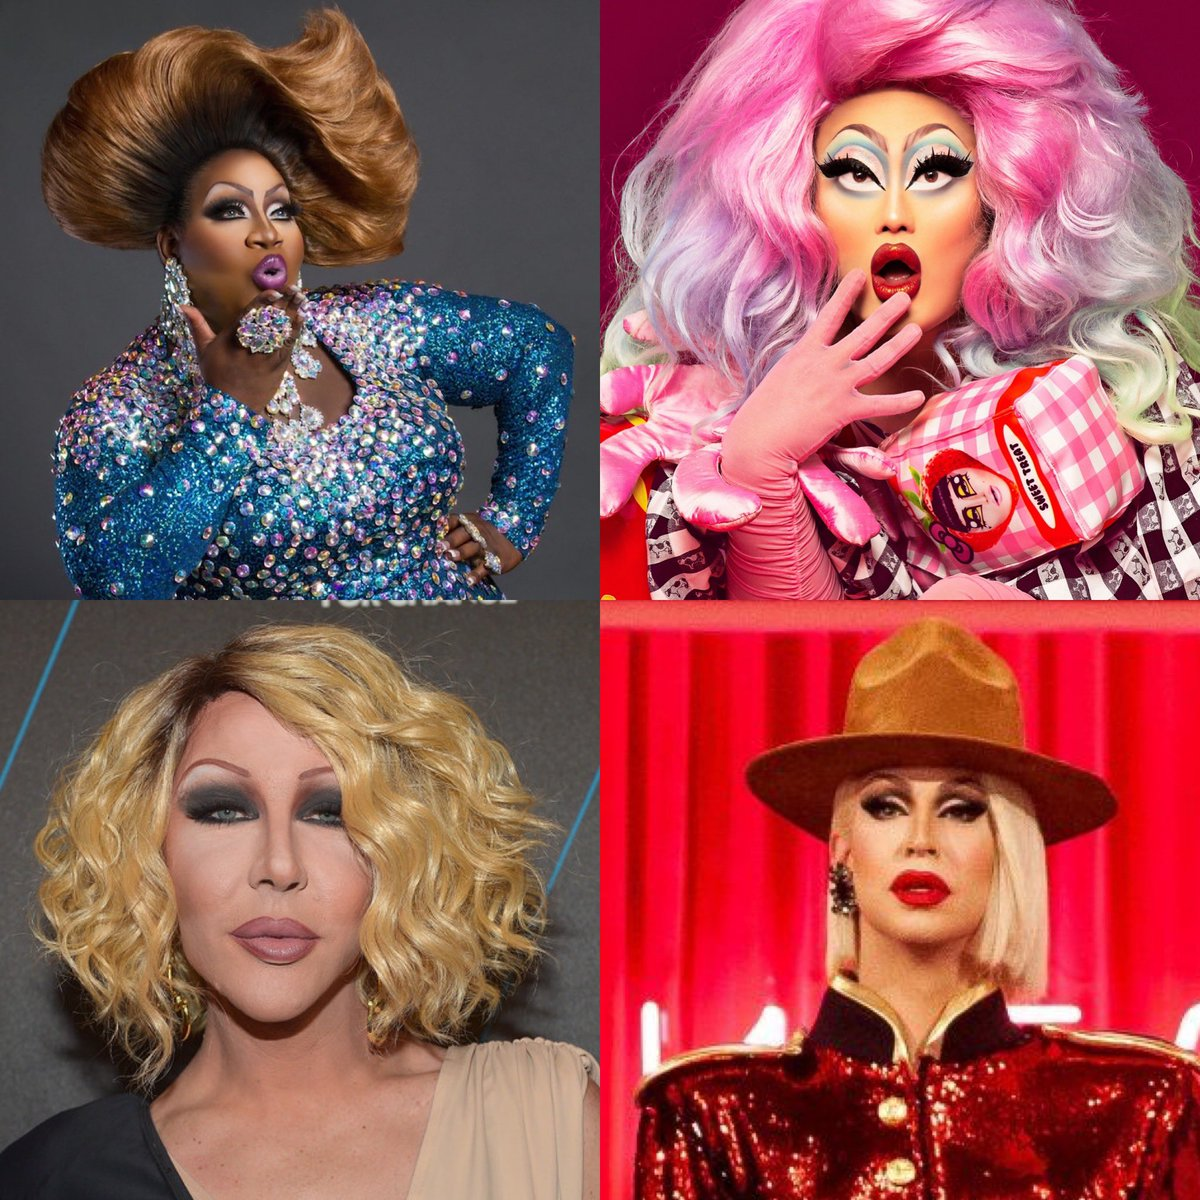 Ok @OriginalFunko @WorldOfWonder @HotTopic here is set #2 of queens we need @LatriceRoyale @KimChi_Chic @ChadMichaels1 @Bhytes1 Let's make it happen!